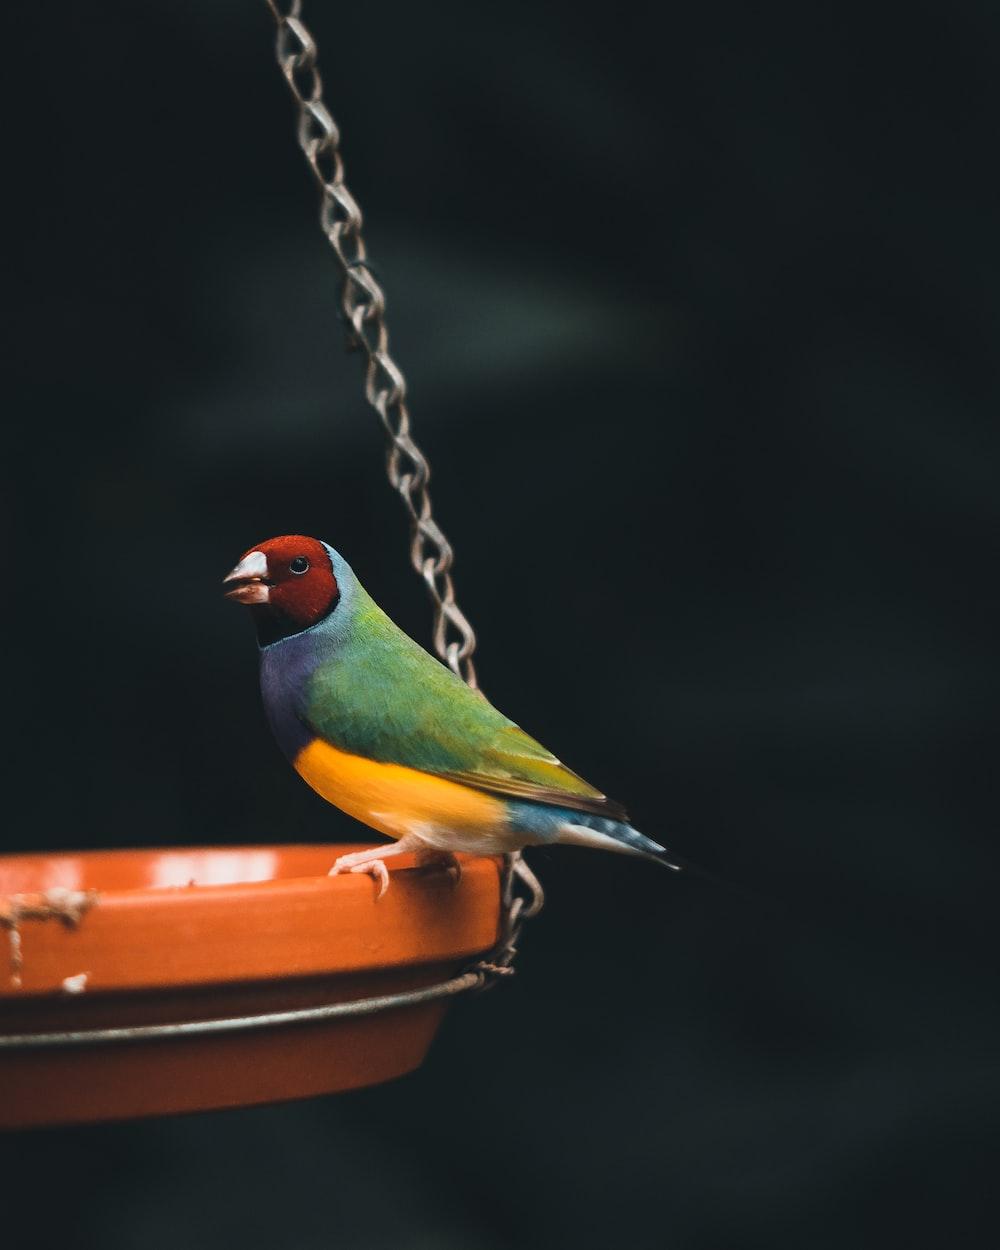 green yellow and orange bird on brown metal chain